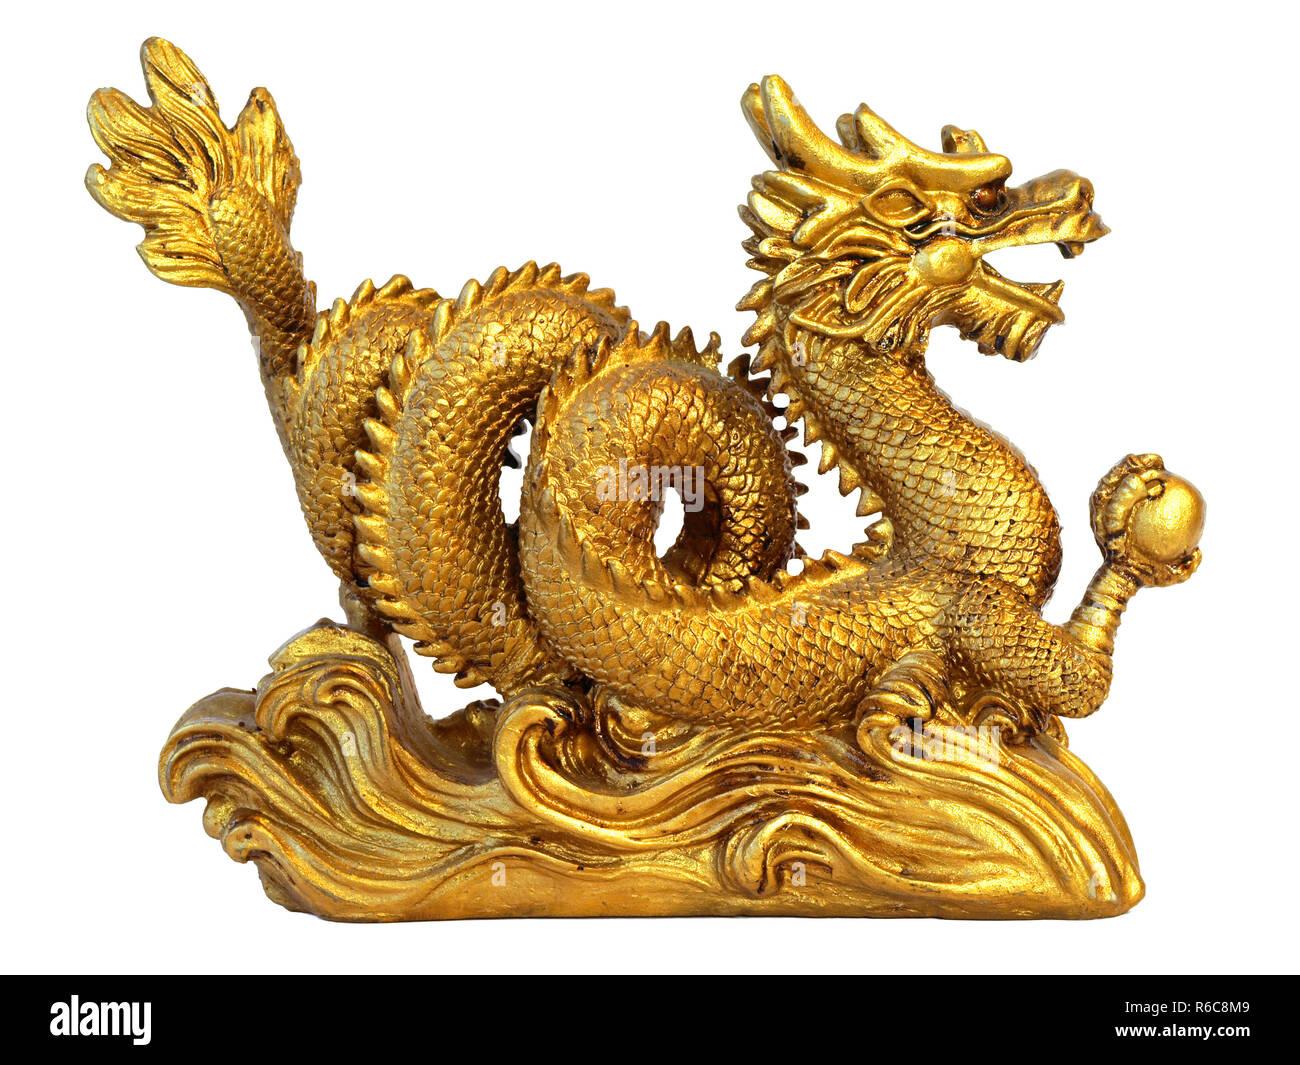 Chinese Feng Shui Dragon - Stock Image